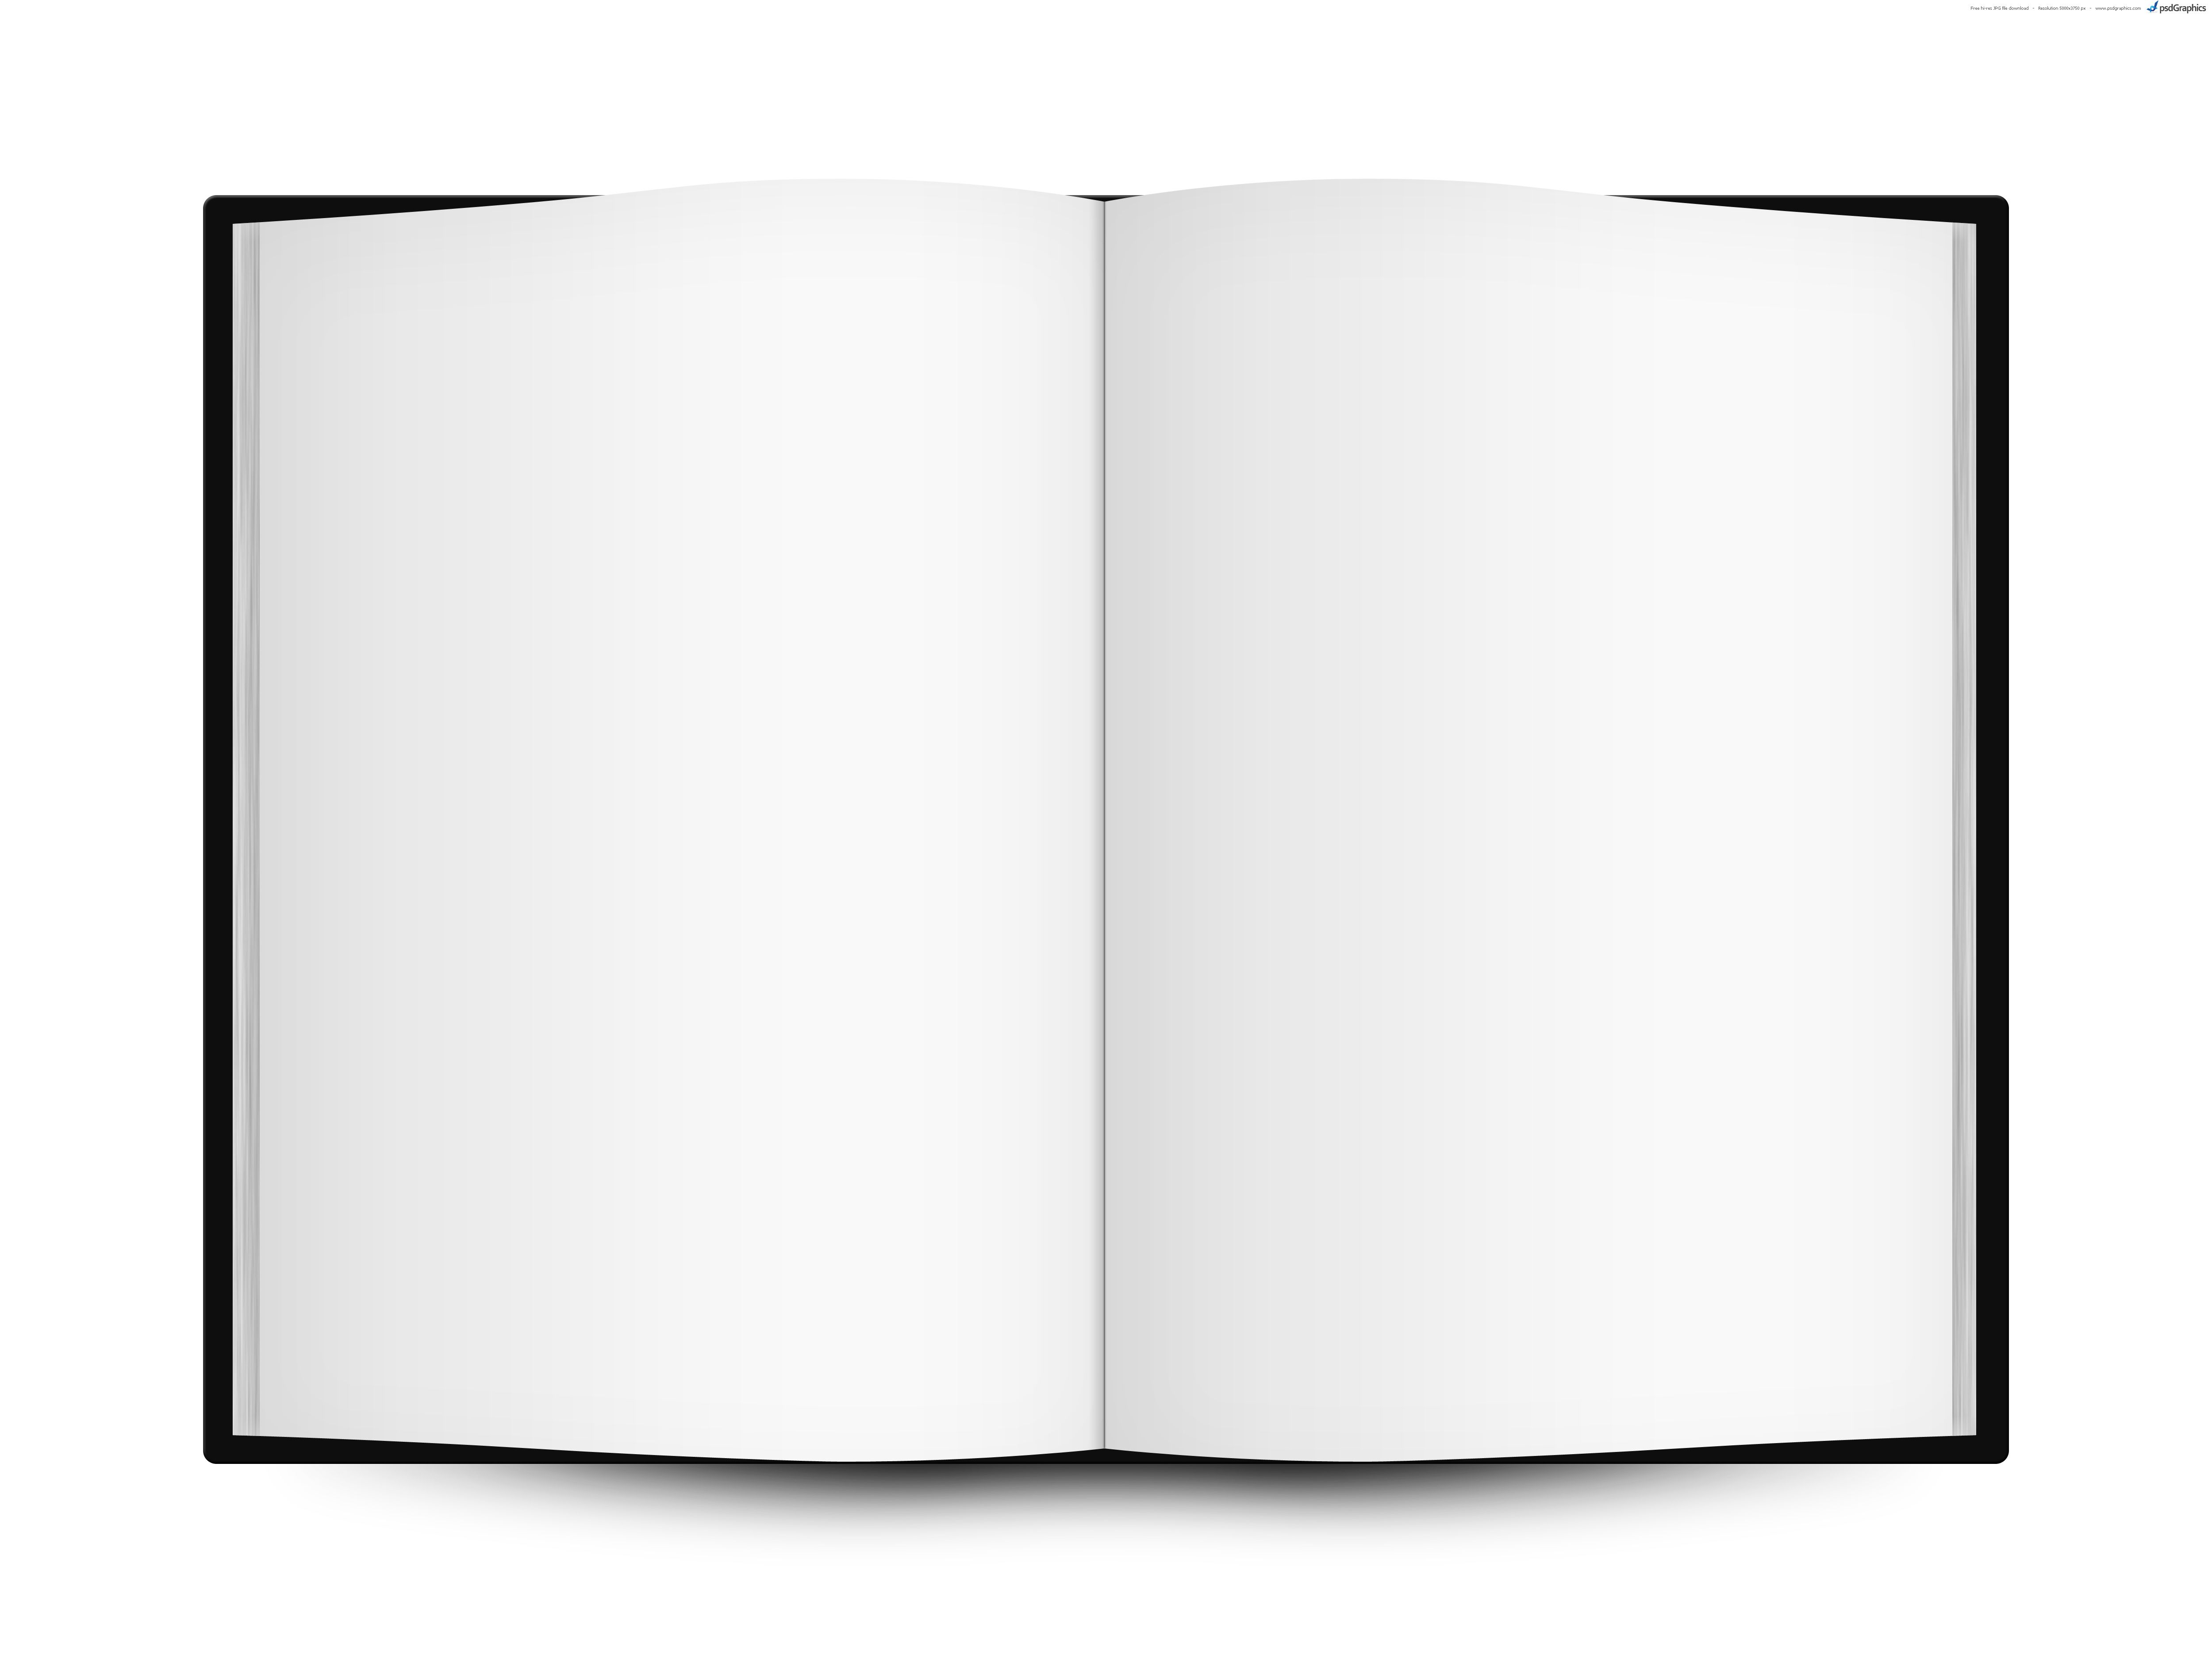 Blank open book template   PSDGraphics   library   Pinterest   Open ...